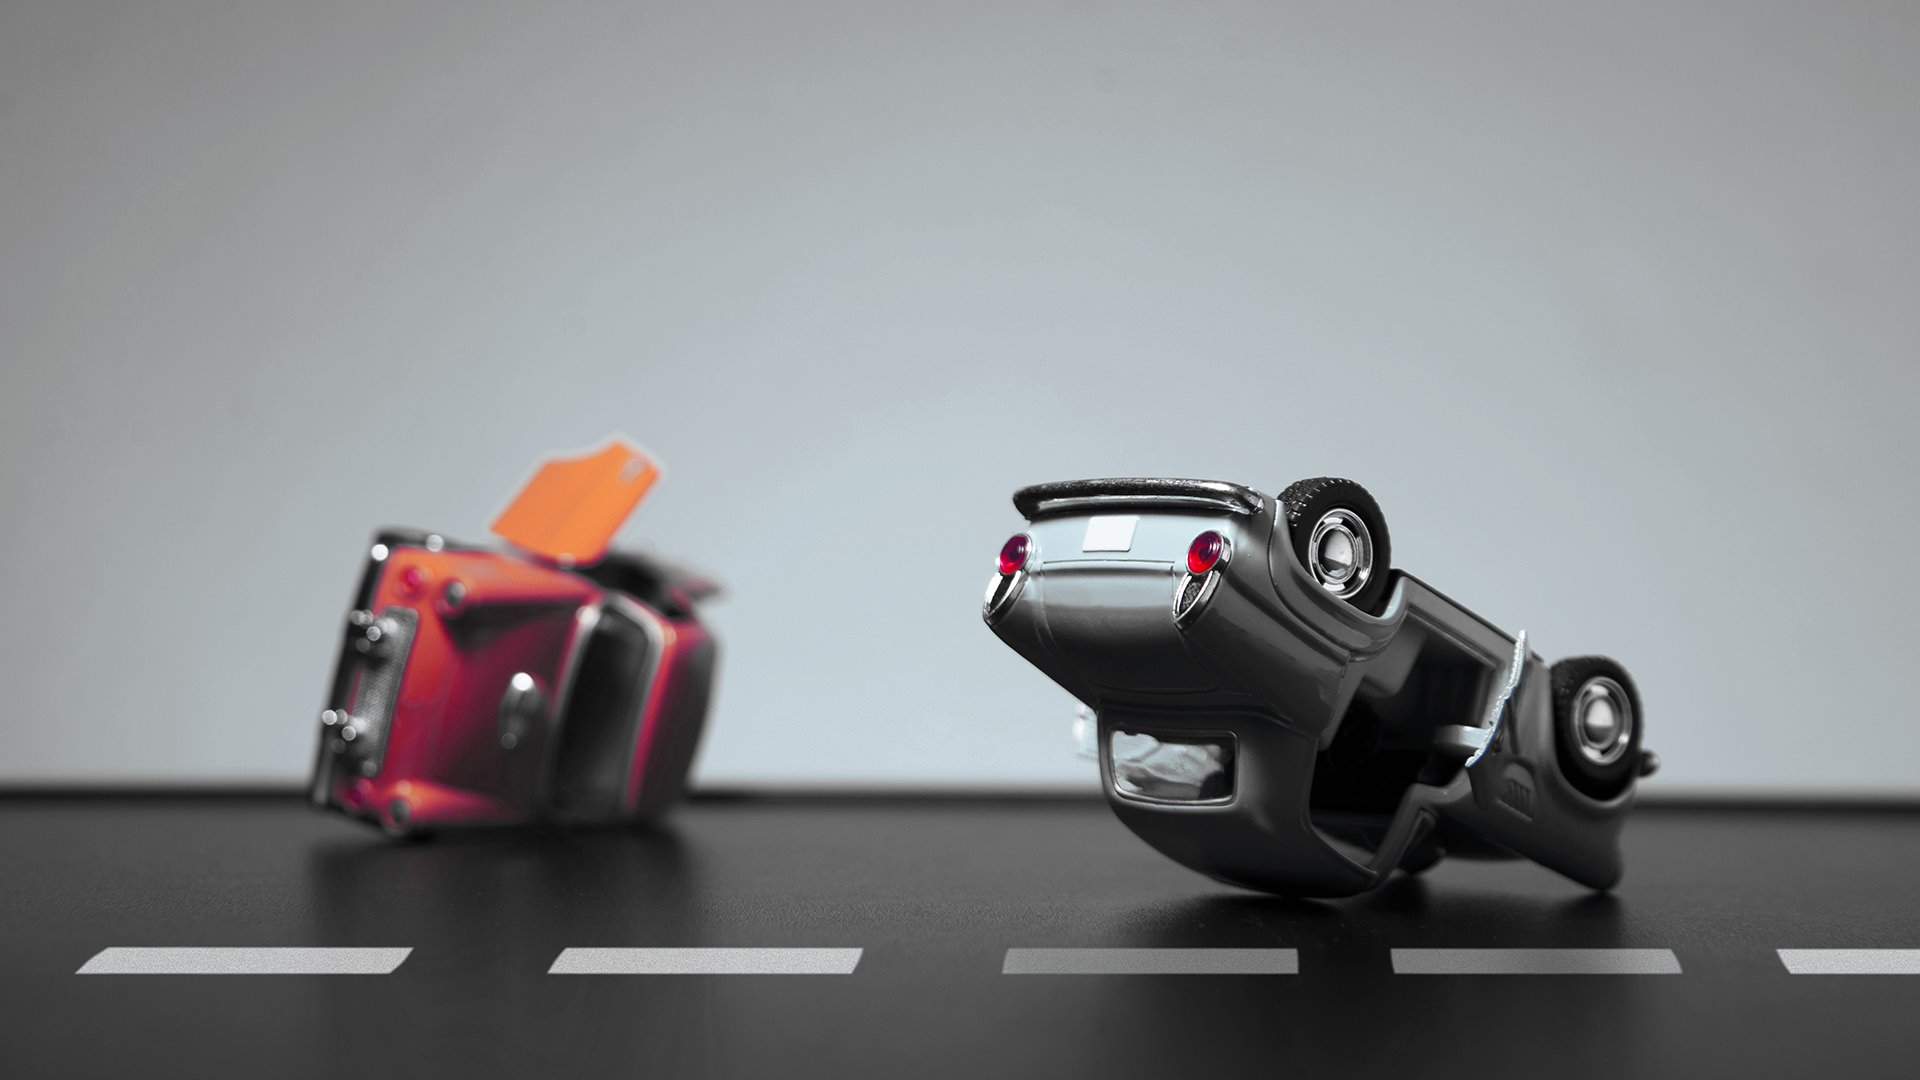 Fantastisch Unfallrekonstruktion Bilder - Verdrahtungsideen - korsmi ...